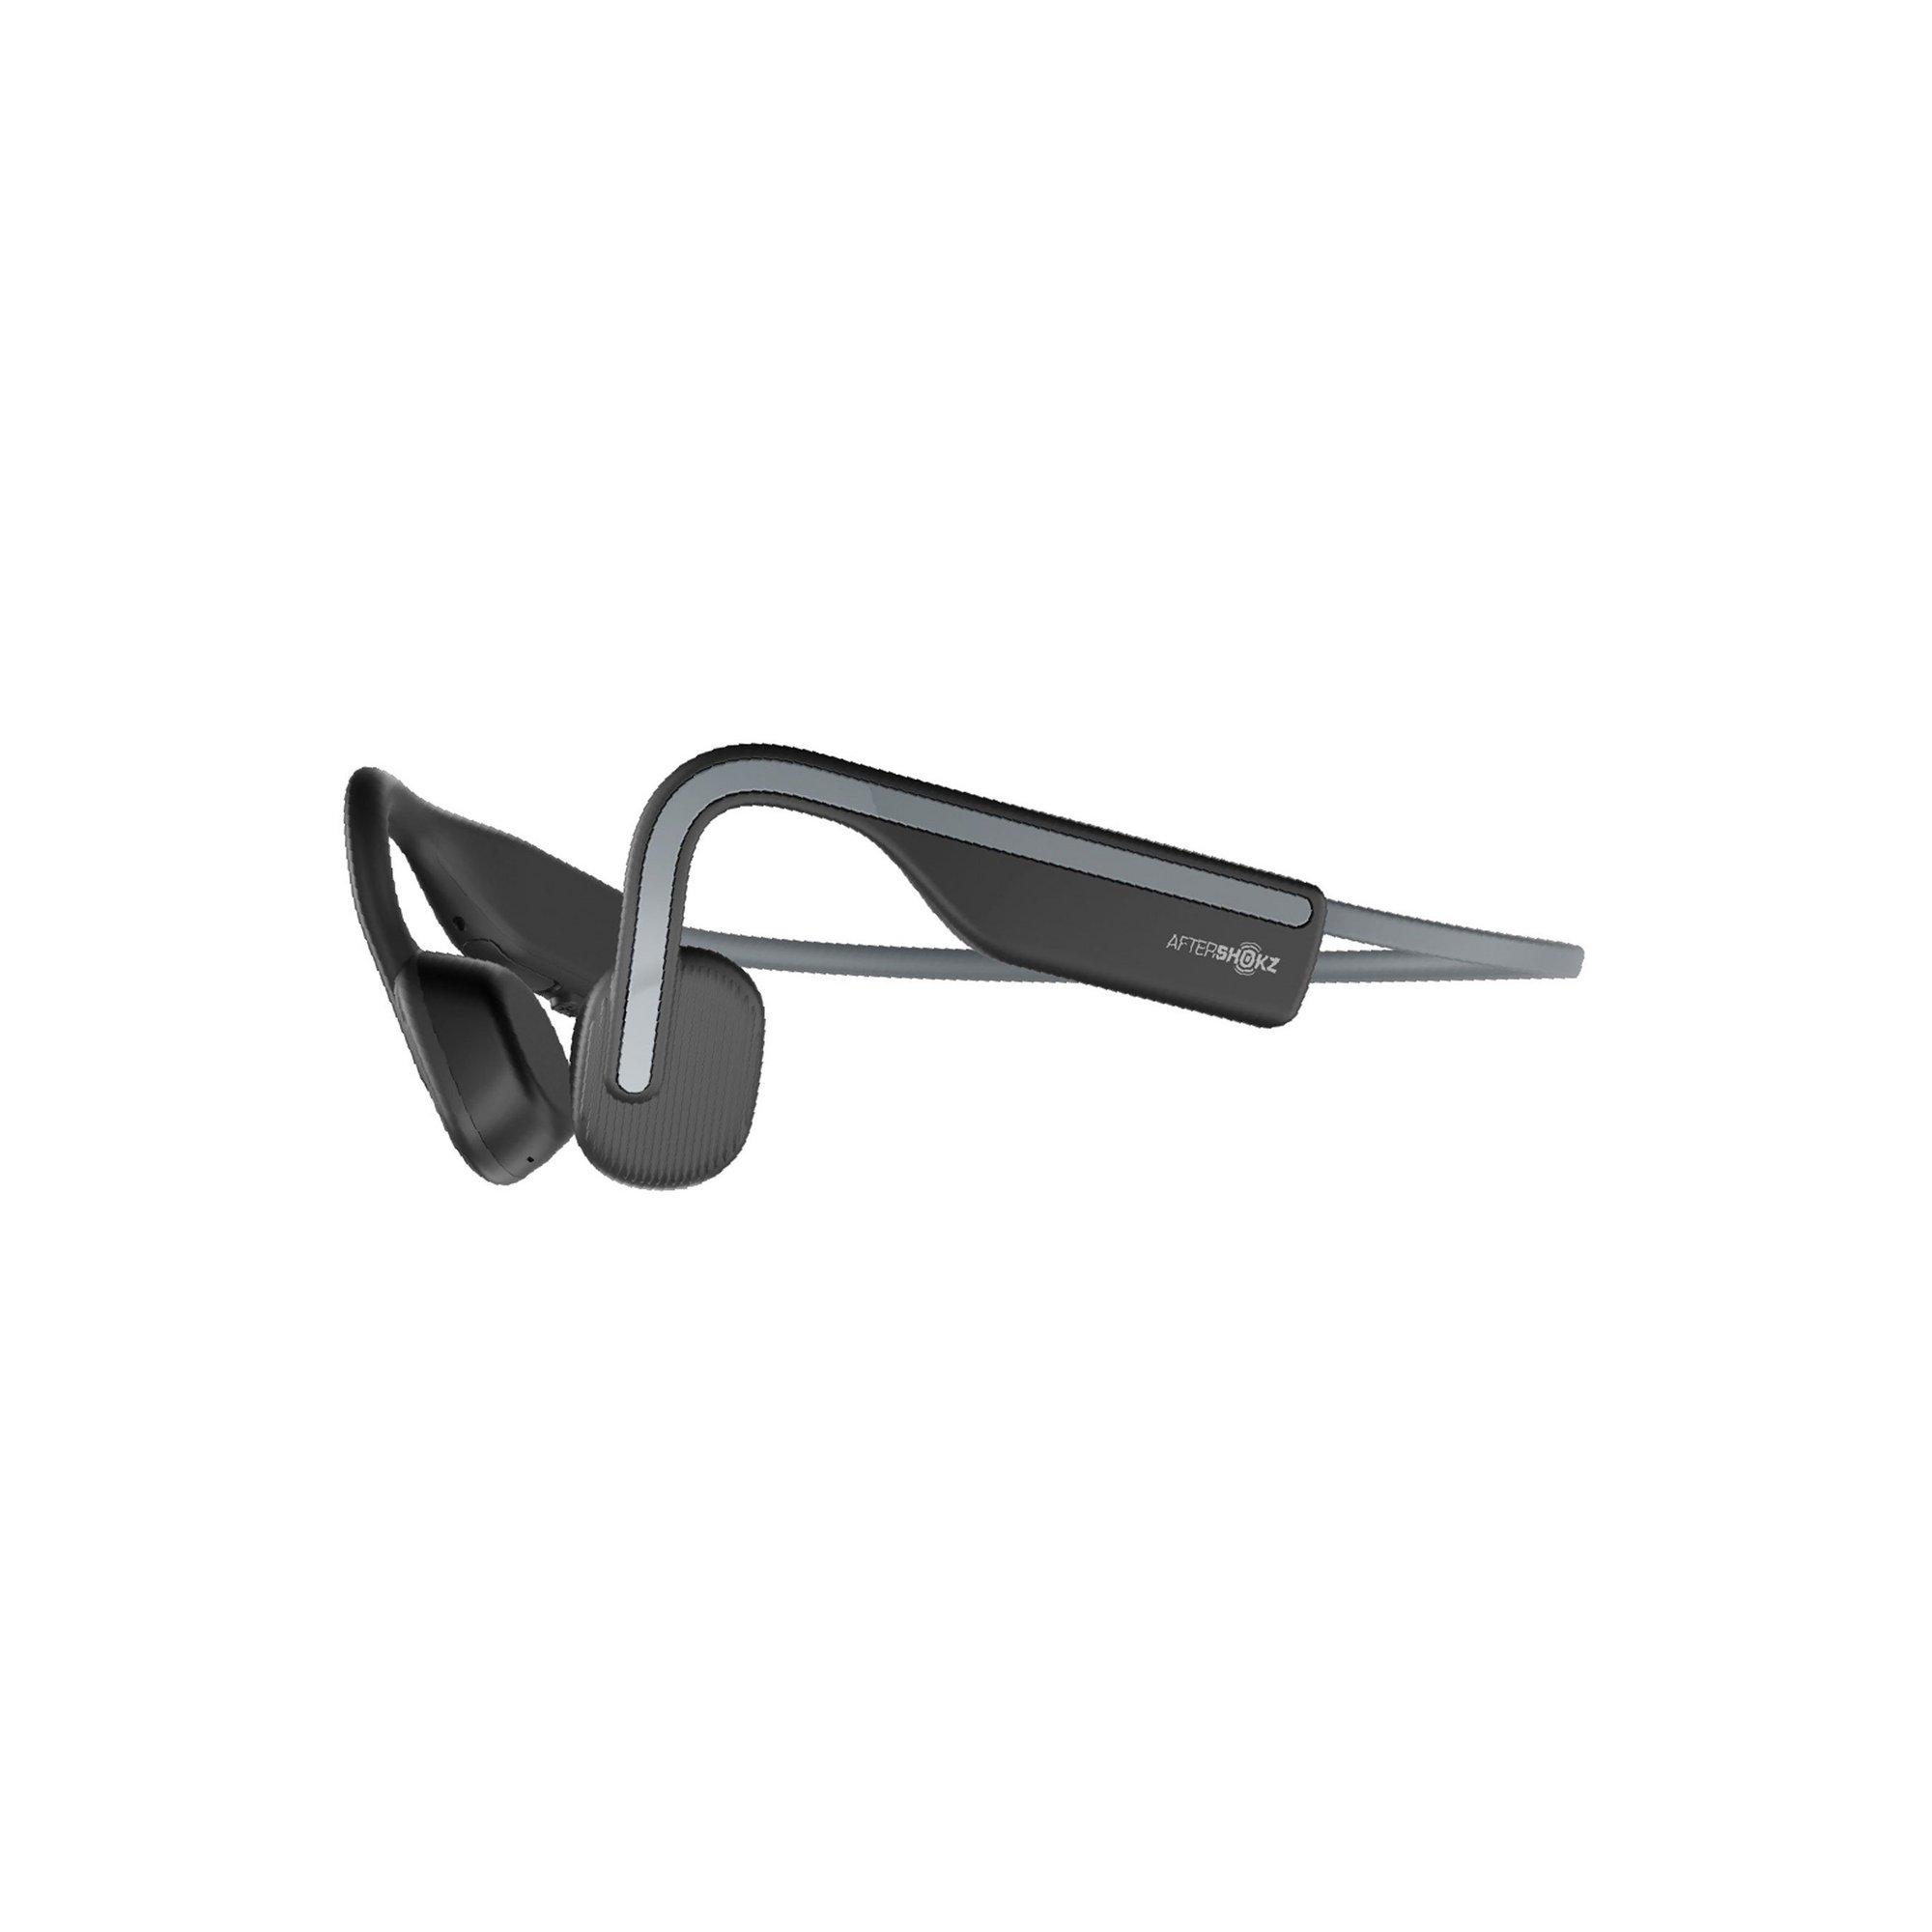 Image of AfterShokz OpenMove Bluetooth Headphones